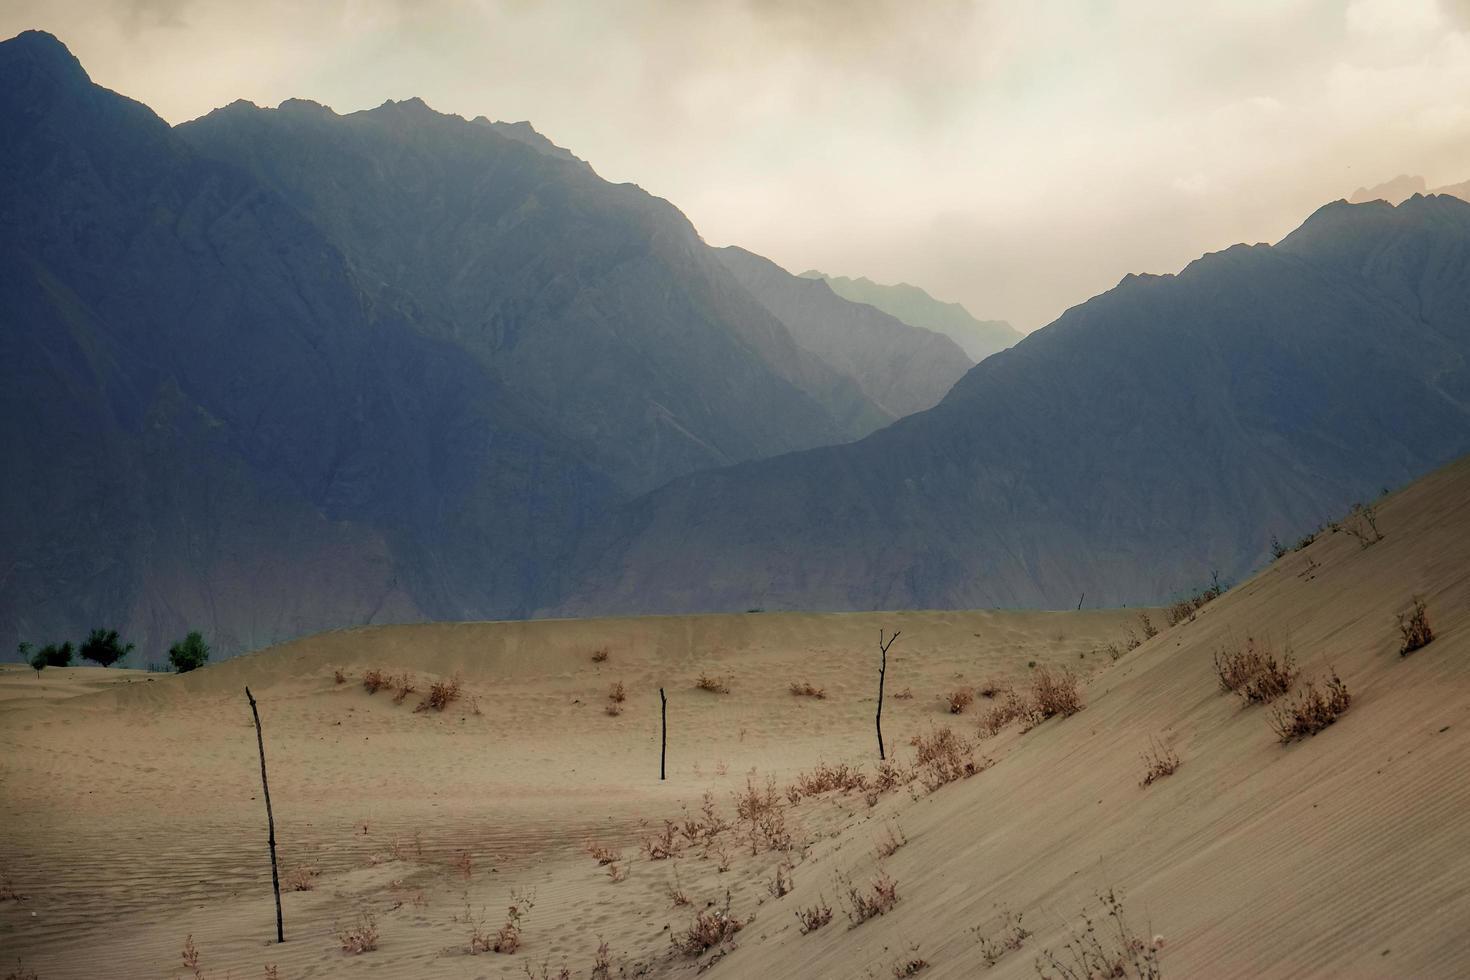 zonsondergang na zandstorm in woestijn foto